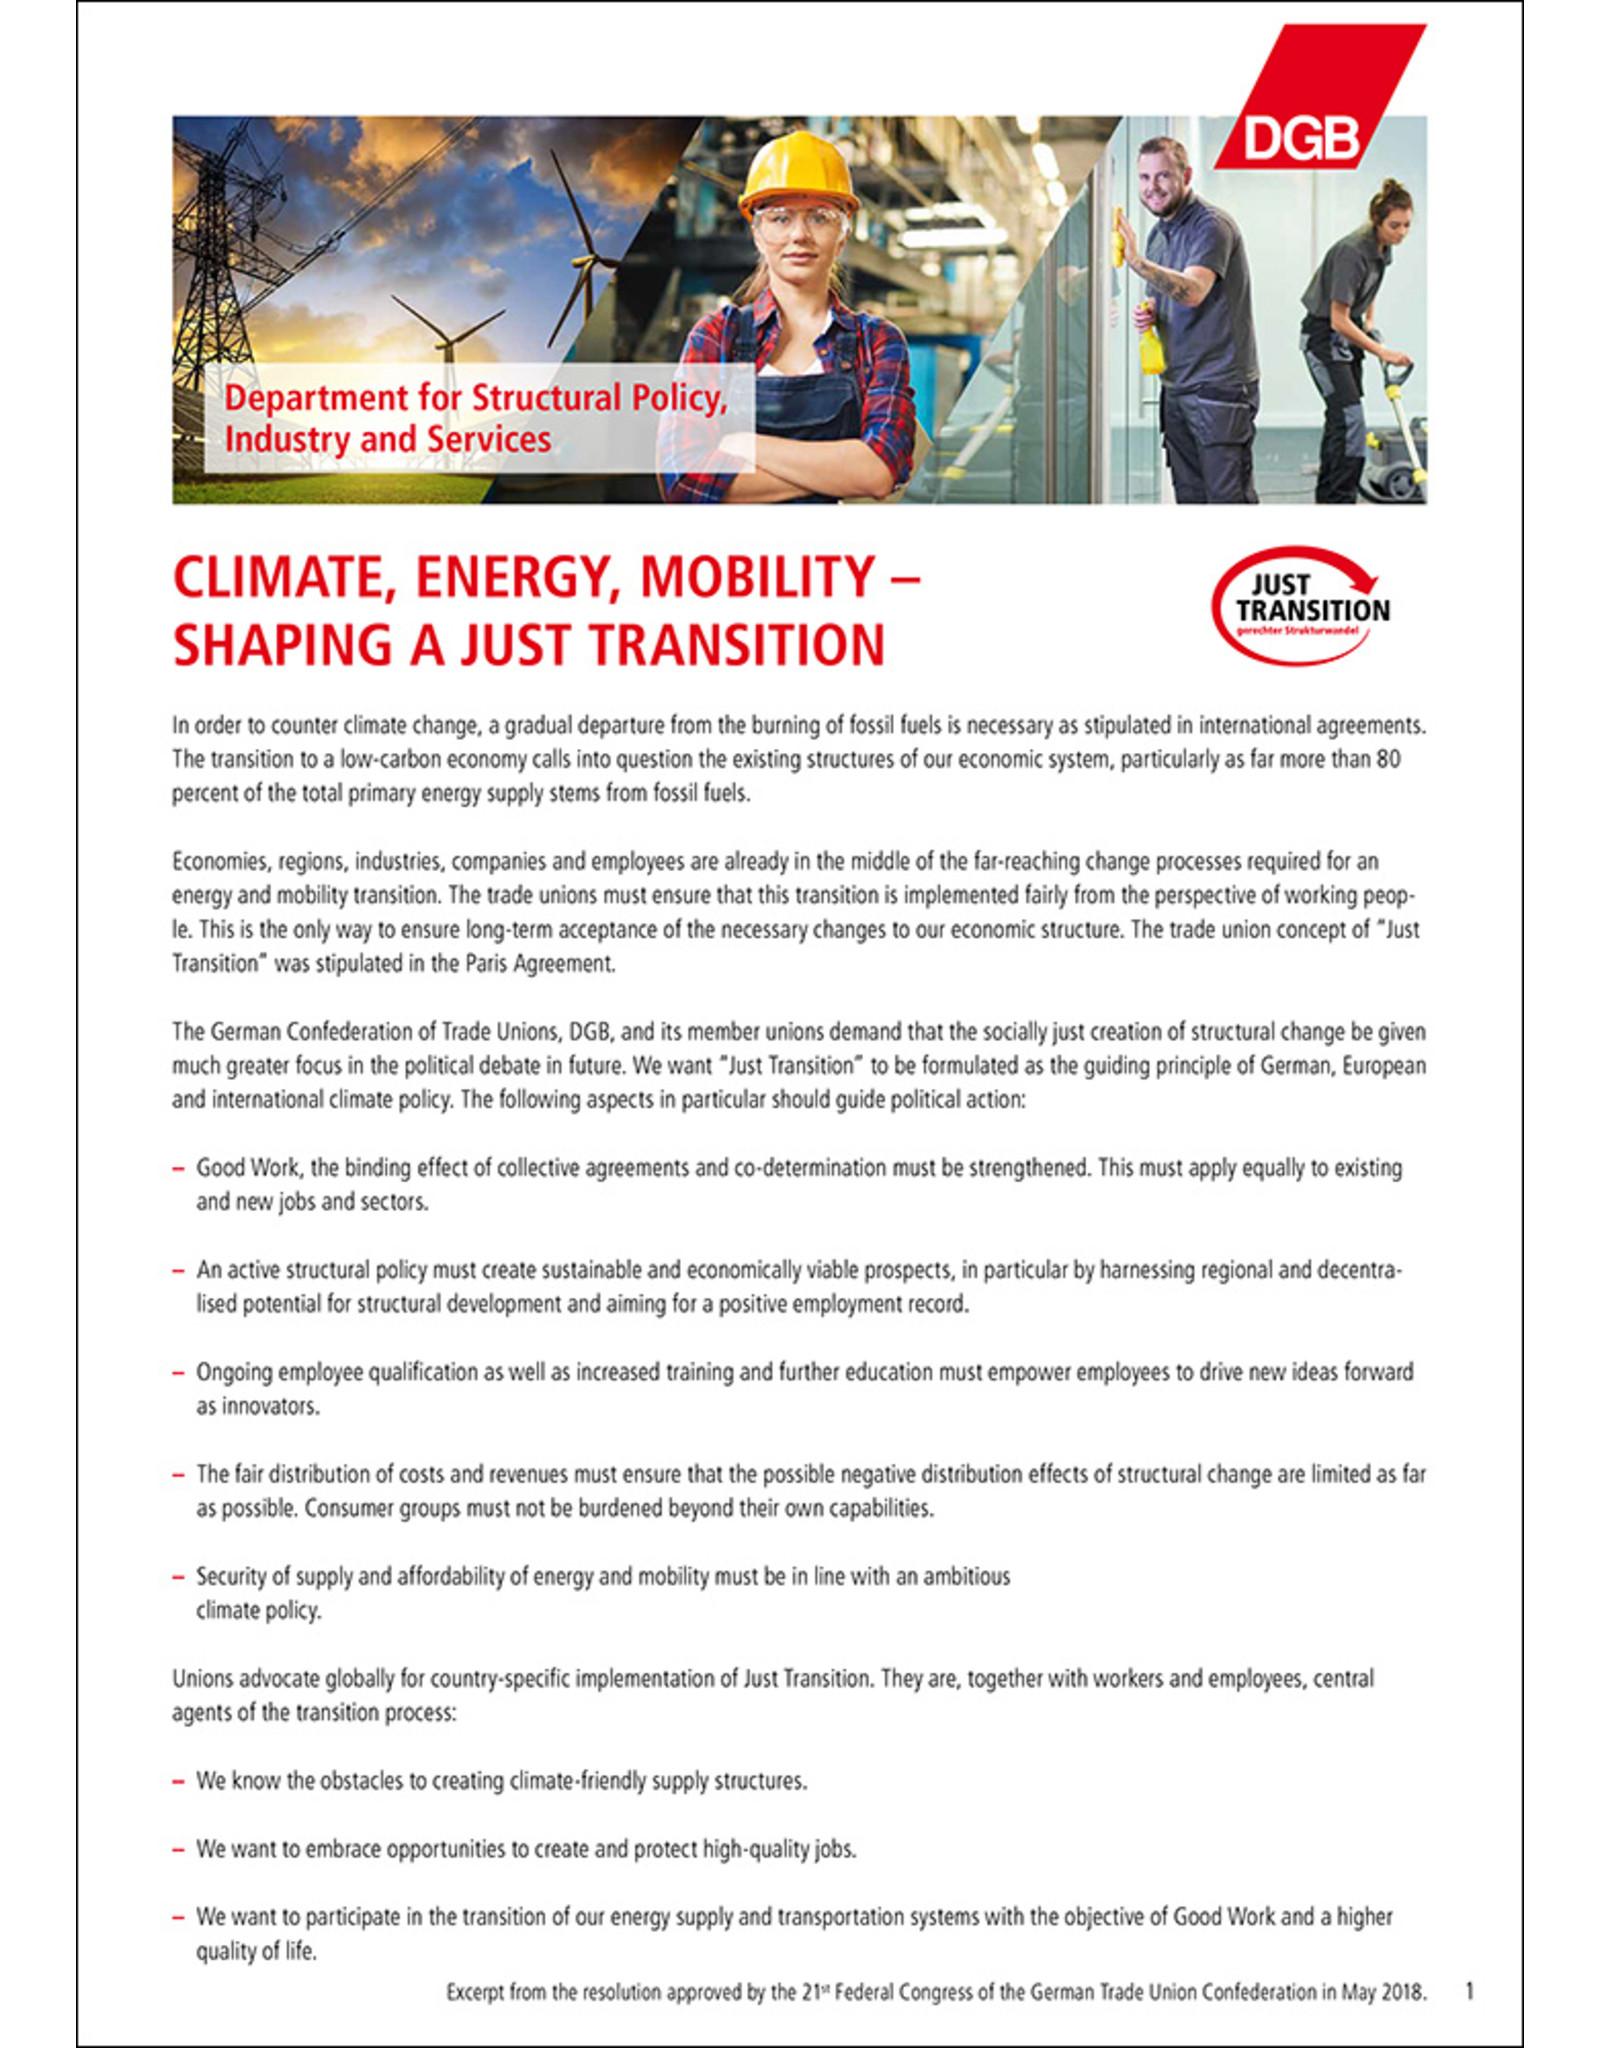 DGB-Shortpaper Climate, Energy, Mobility